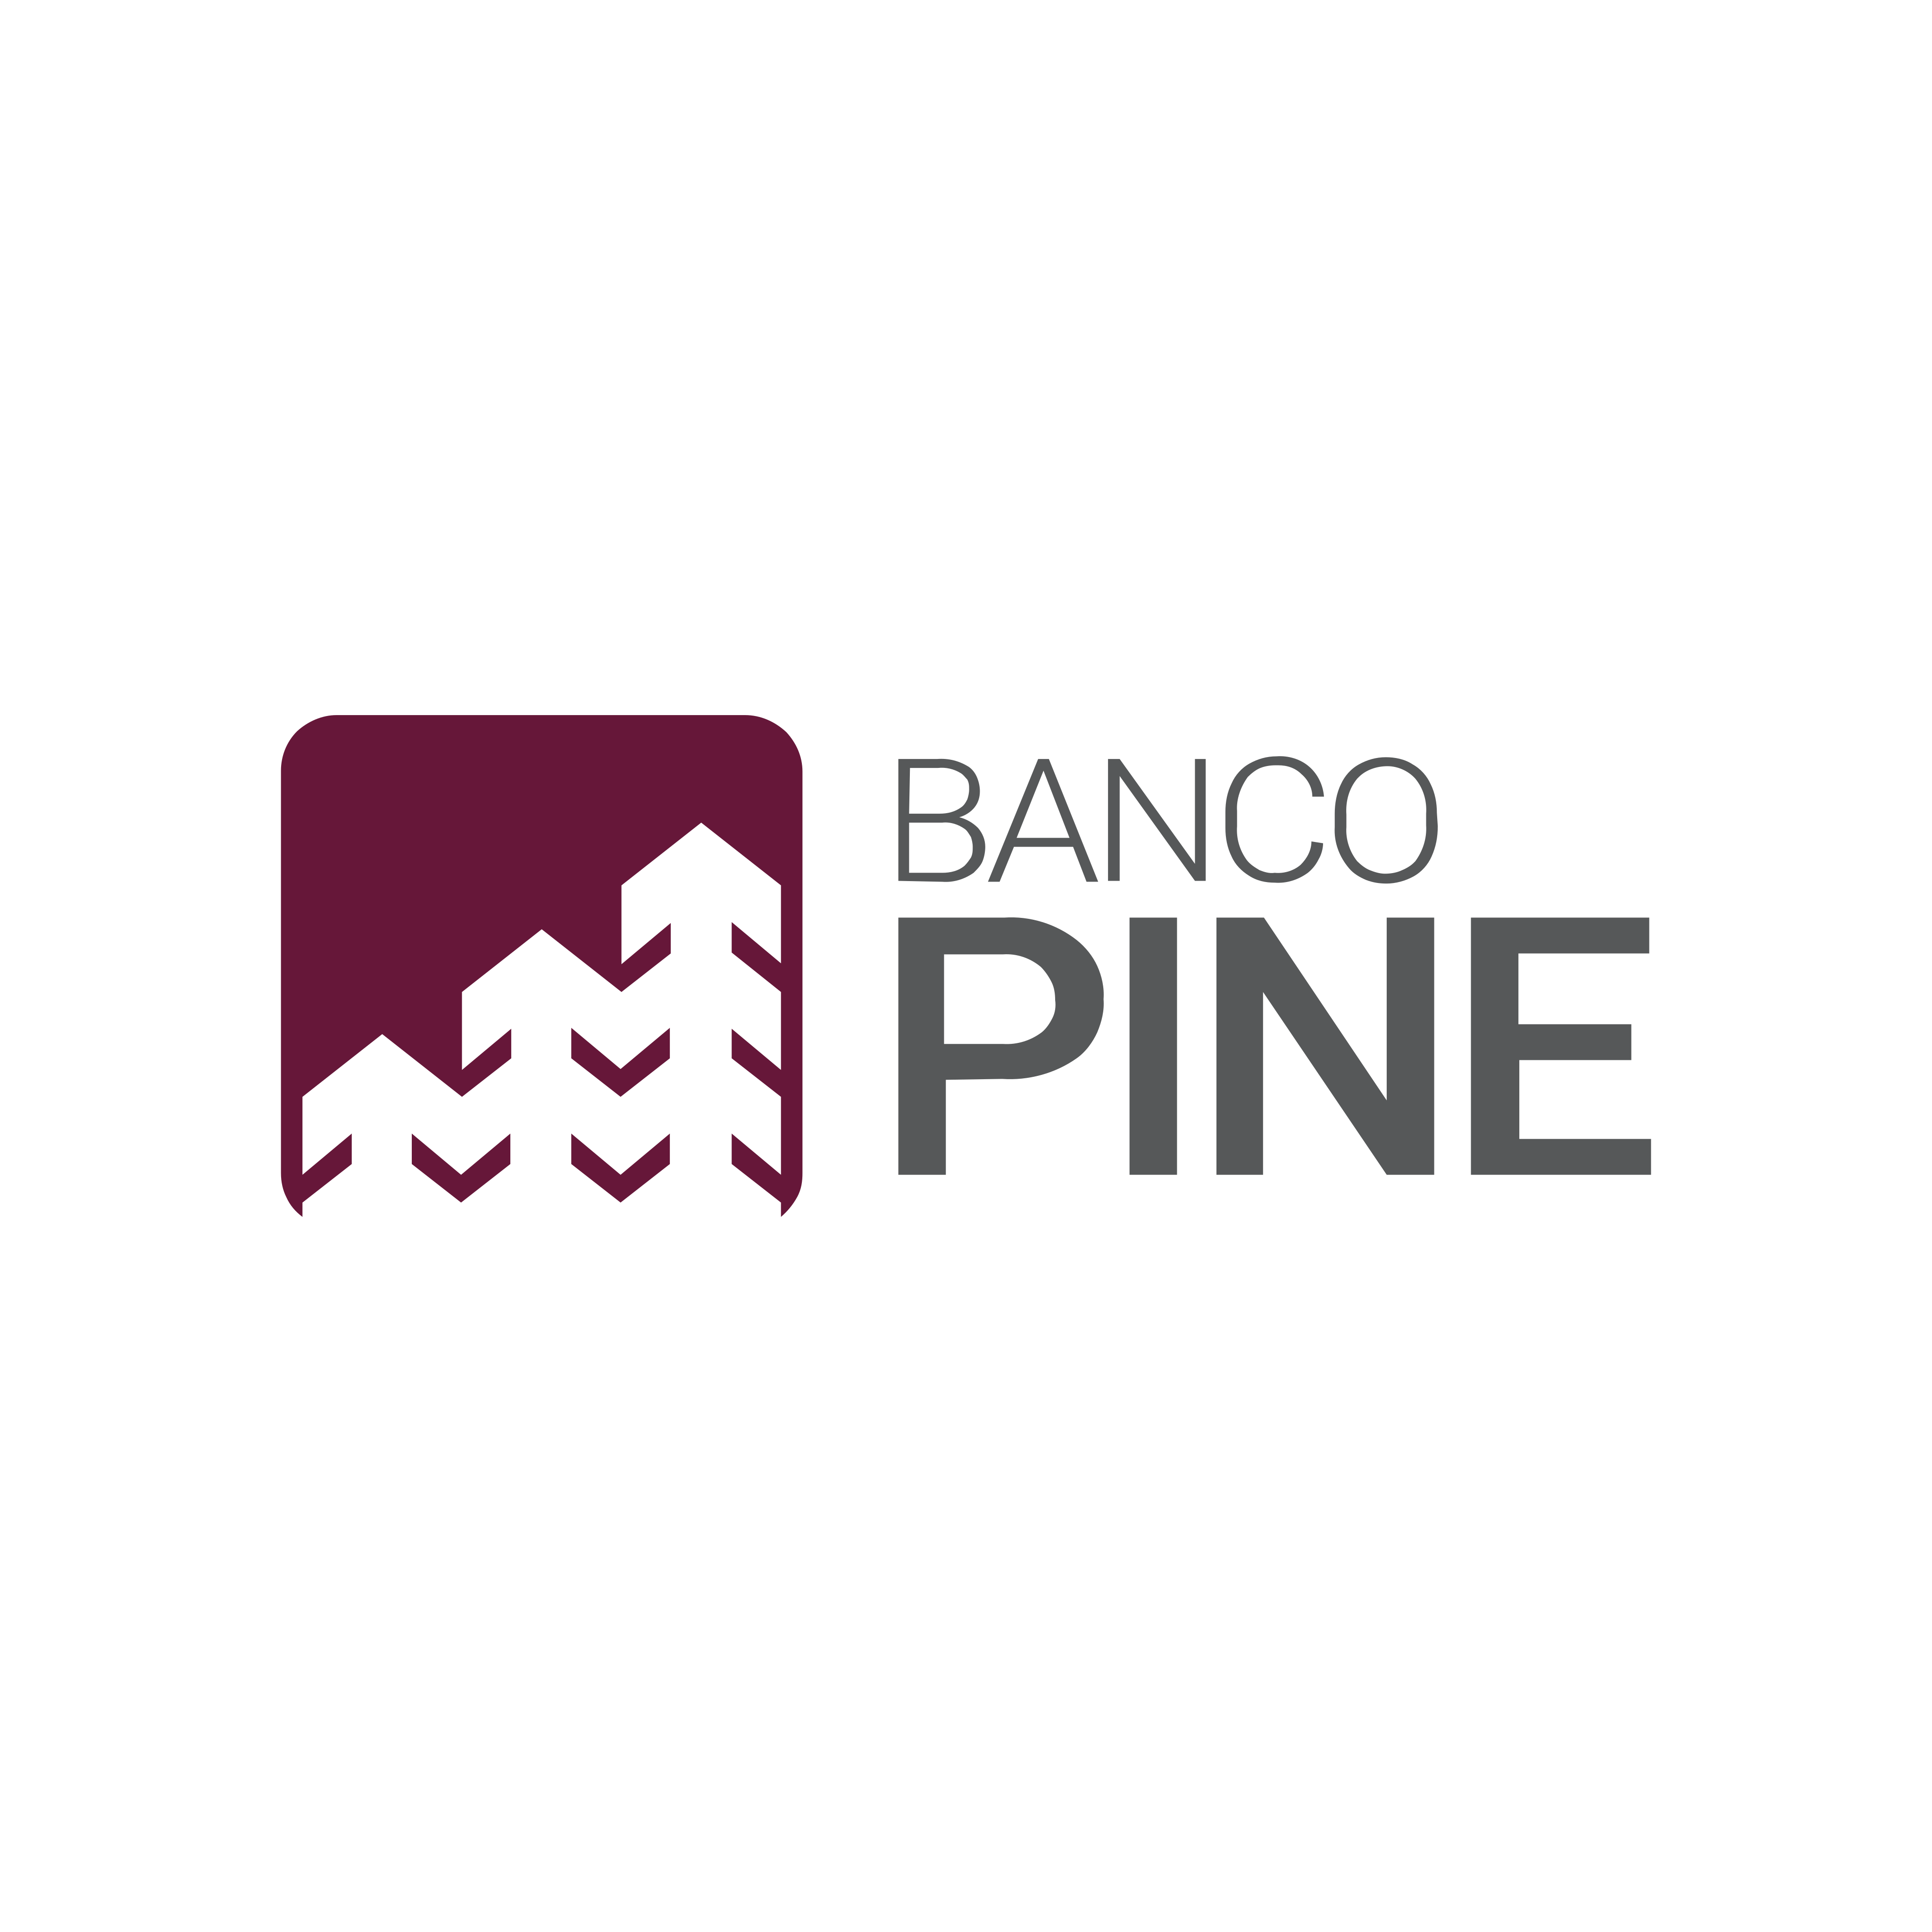 banco pine logo 0 - Banco Pine Logo